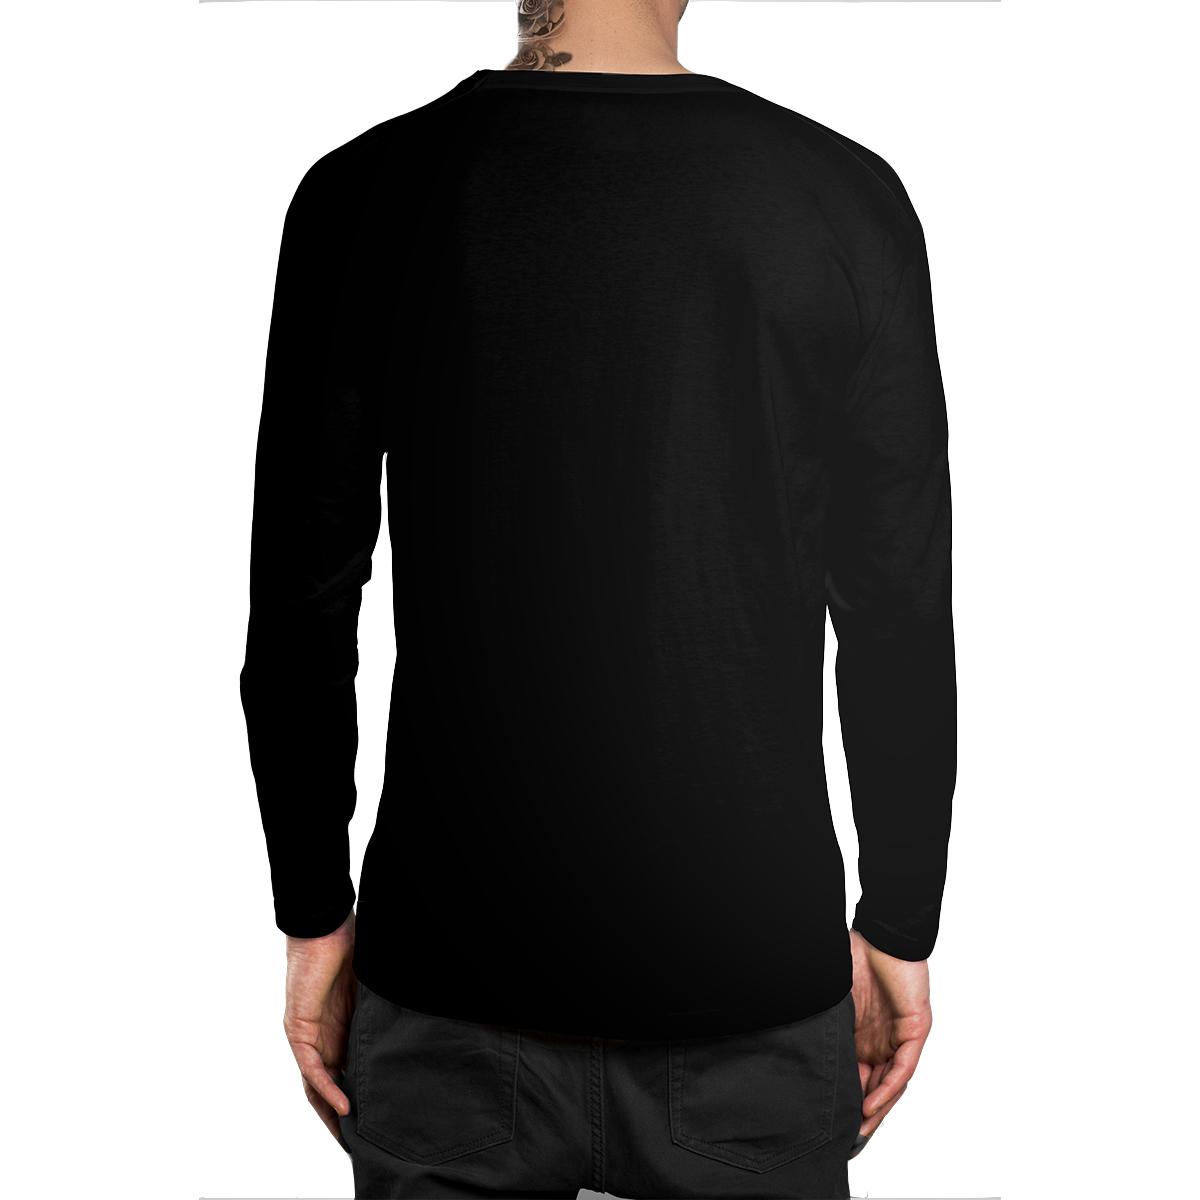 Stompy Camiseta Manga Longa Modelo 21